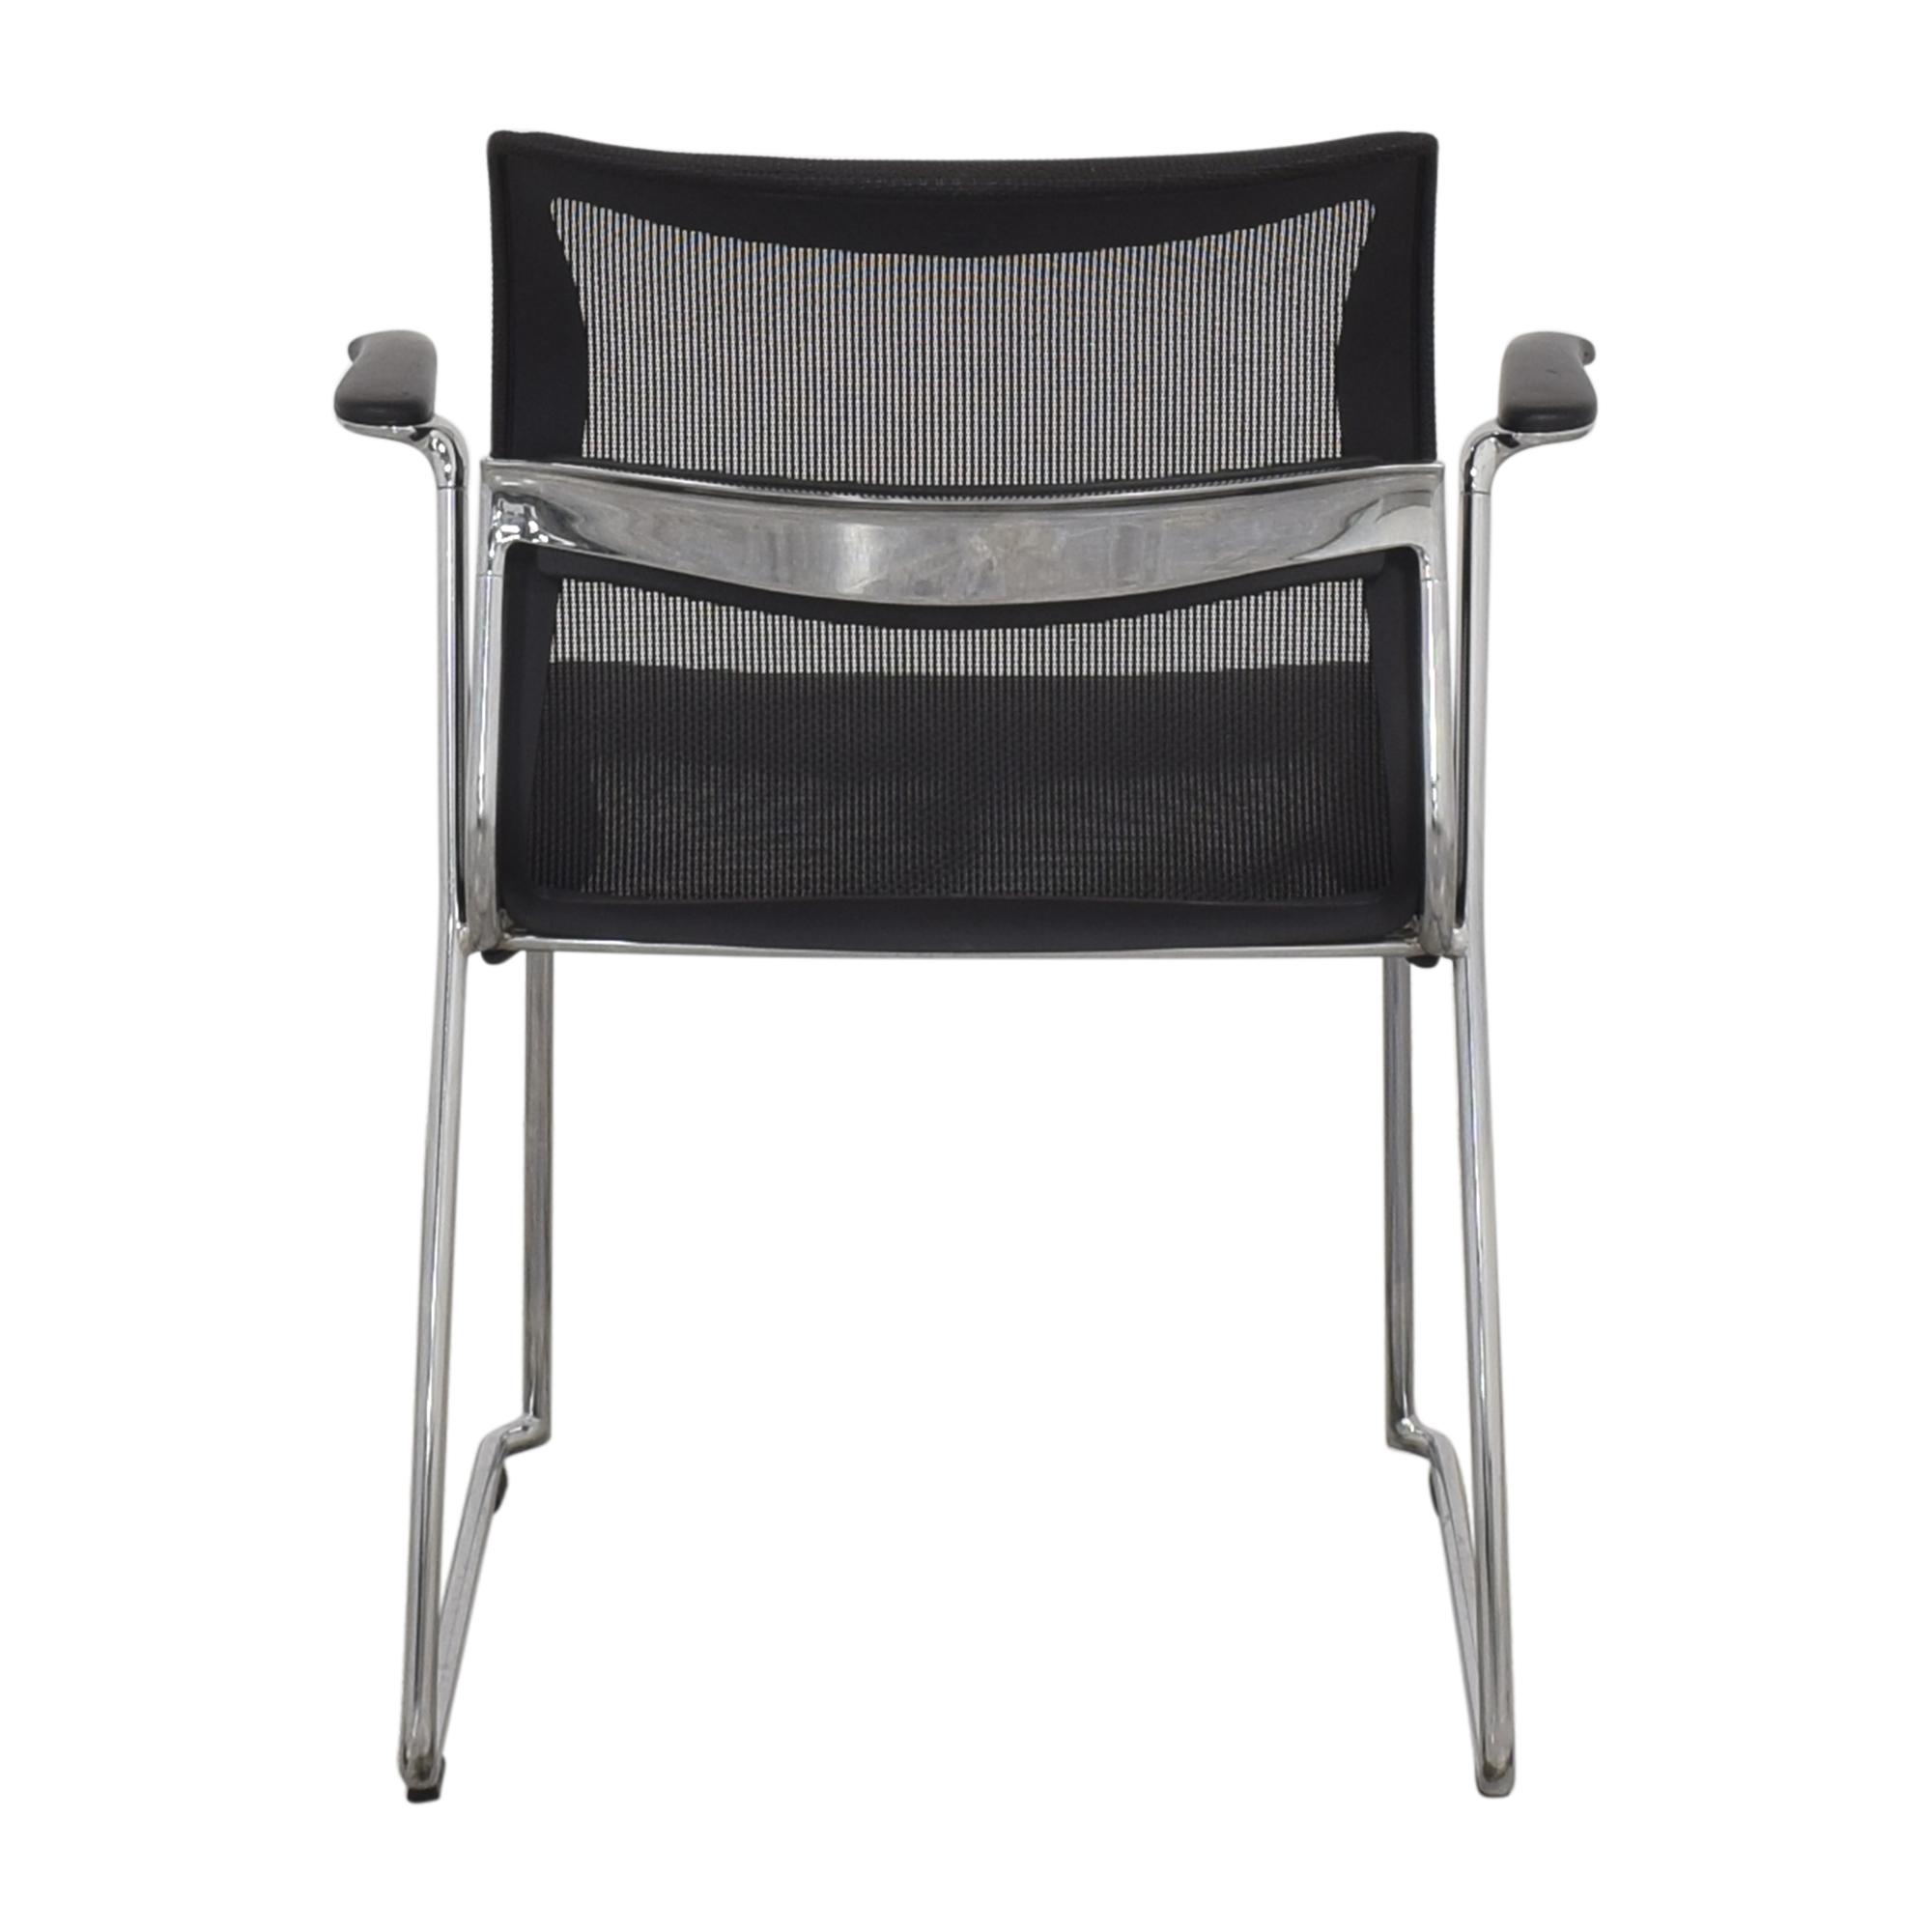 Stylex Stylex Zephyr Stacking Arm Chair nj